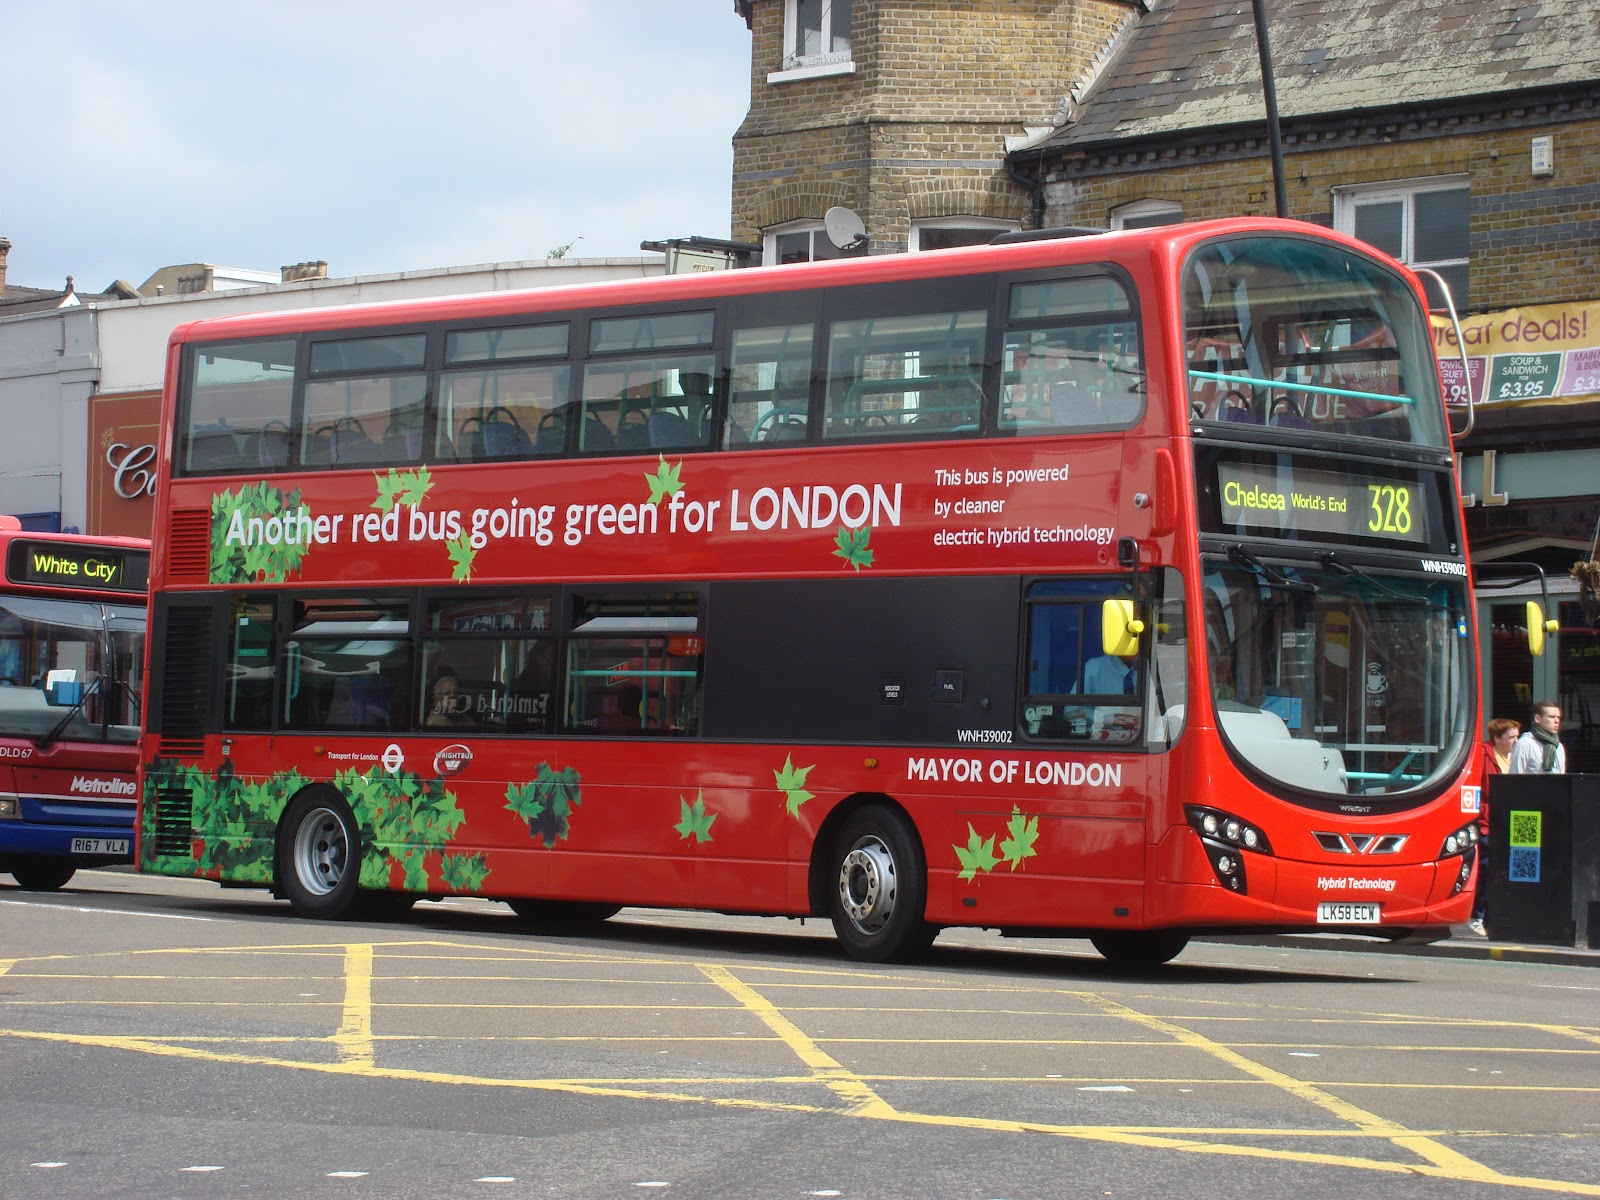 ( Photo: London's hybrid bus)